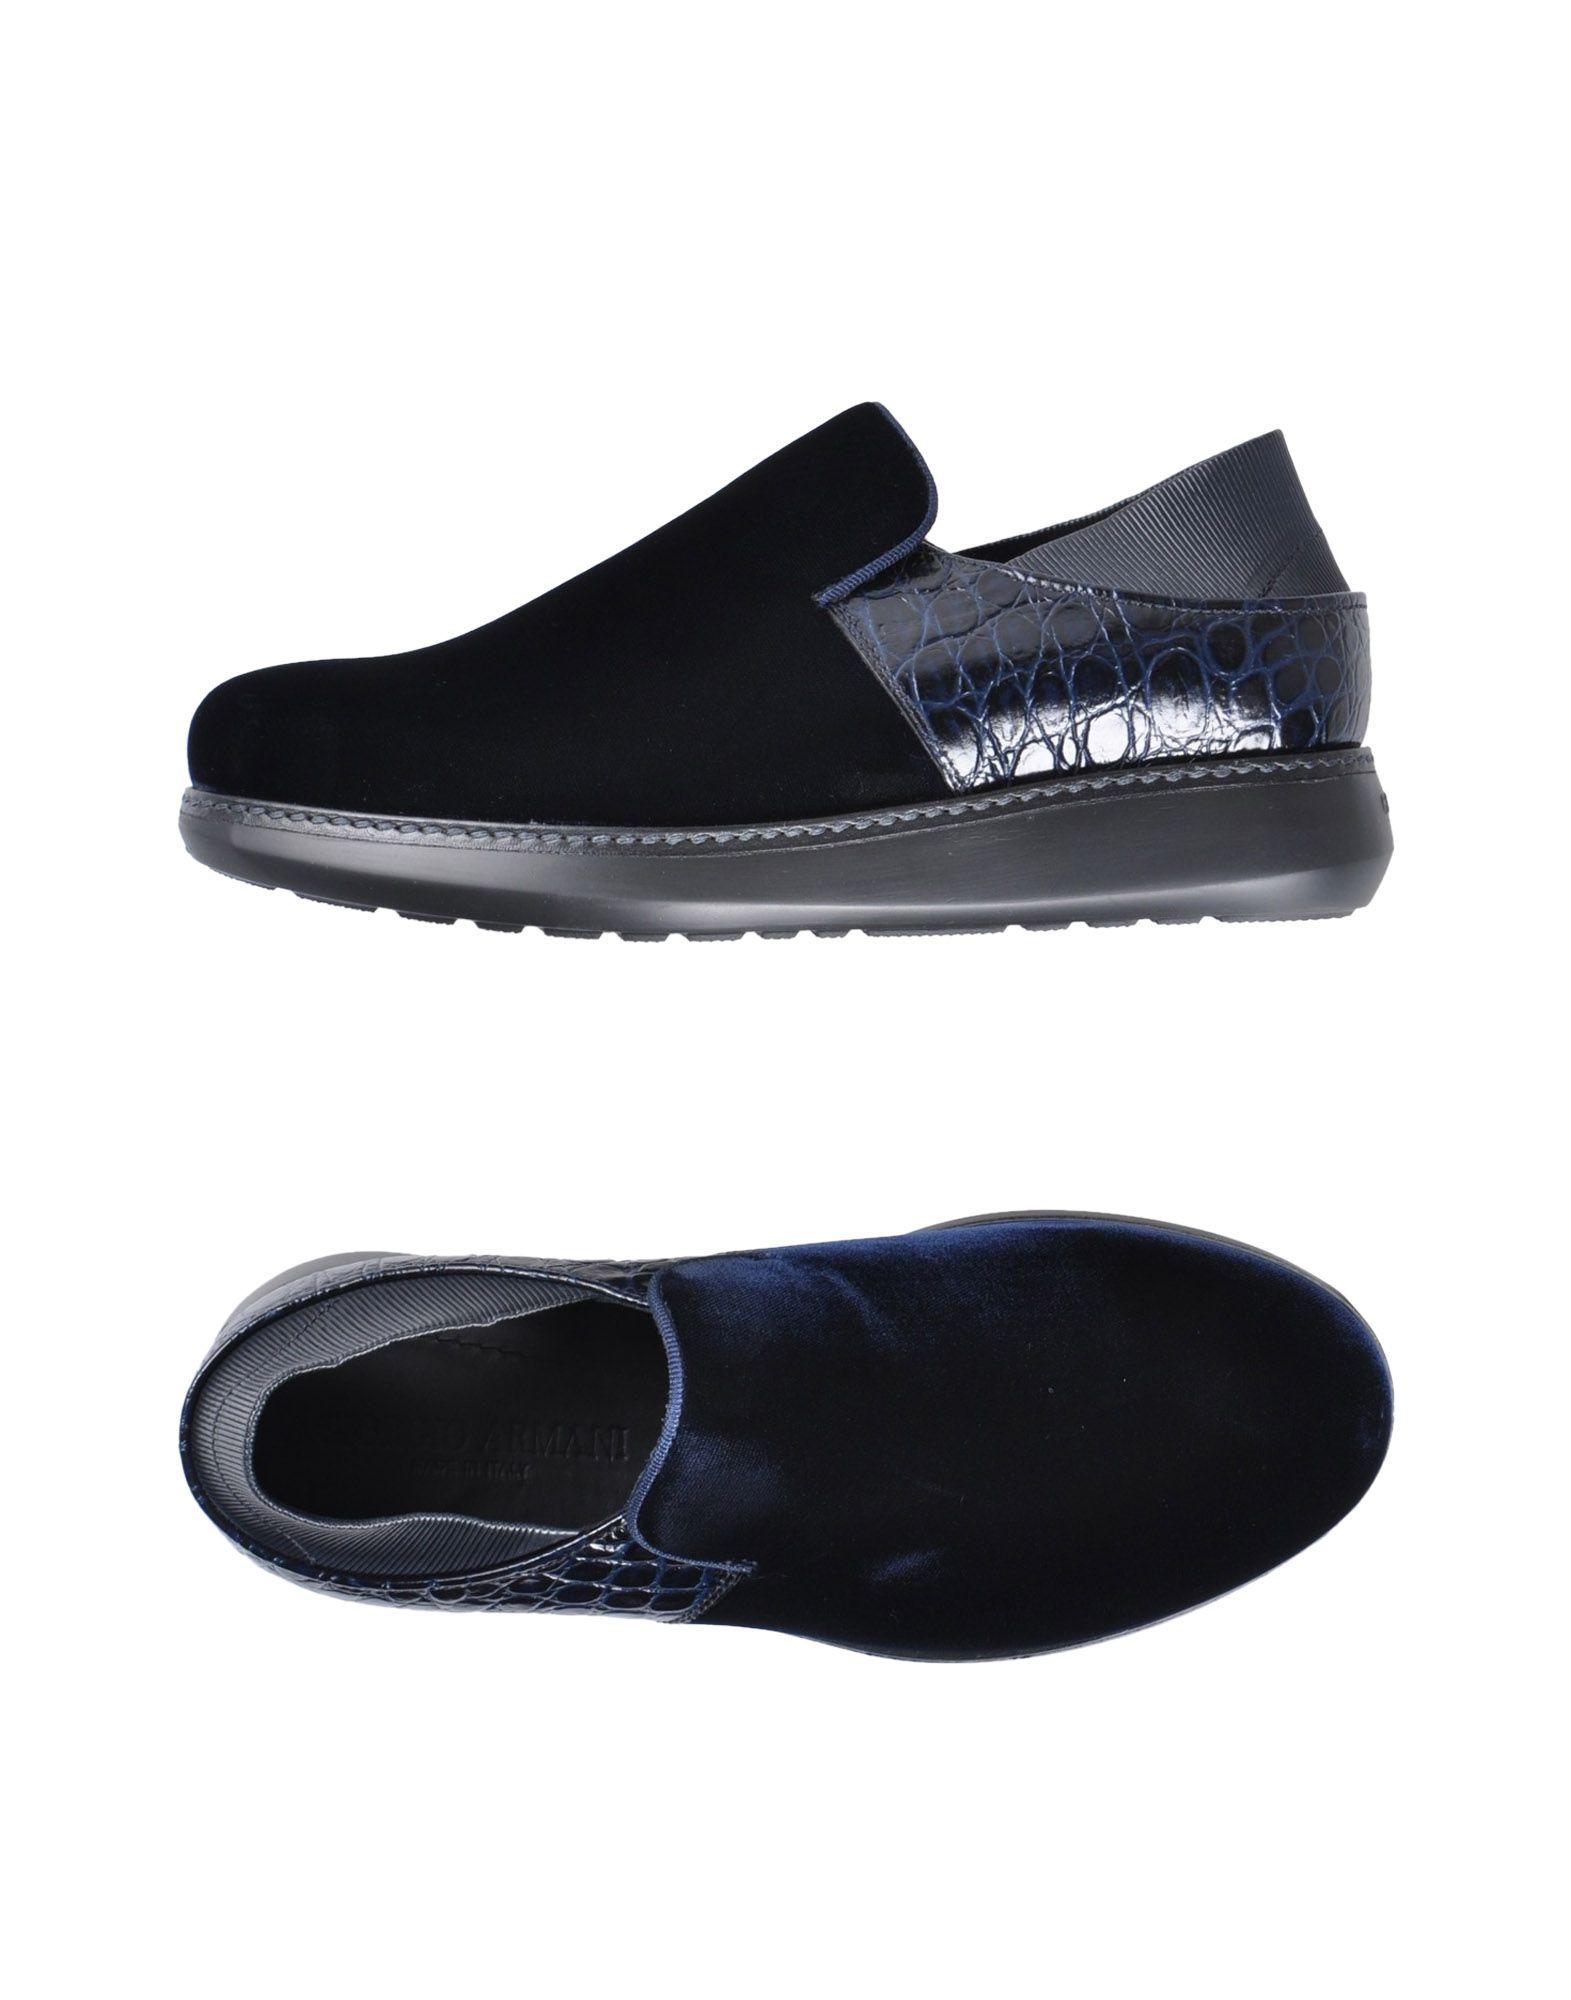 Sneakers Giorgio Armani Homme - Sneakers Giorgio Armani  Bleu foncé Confortable et belle